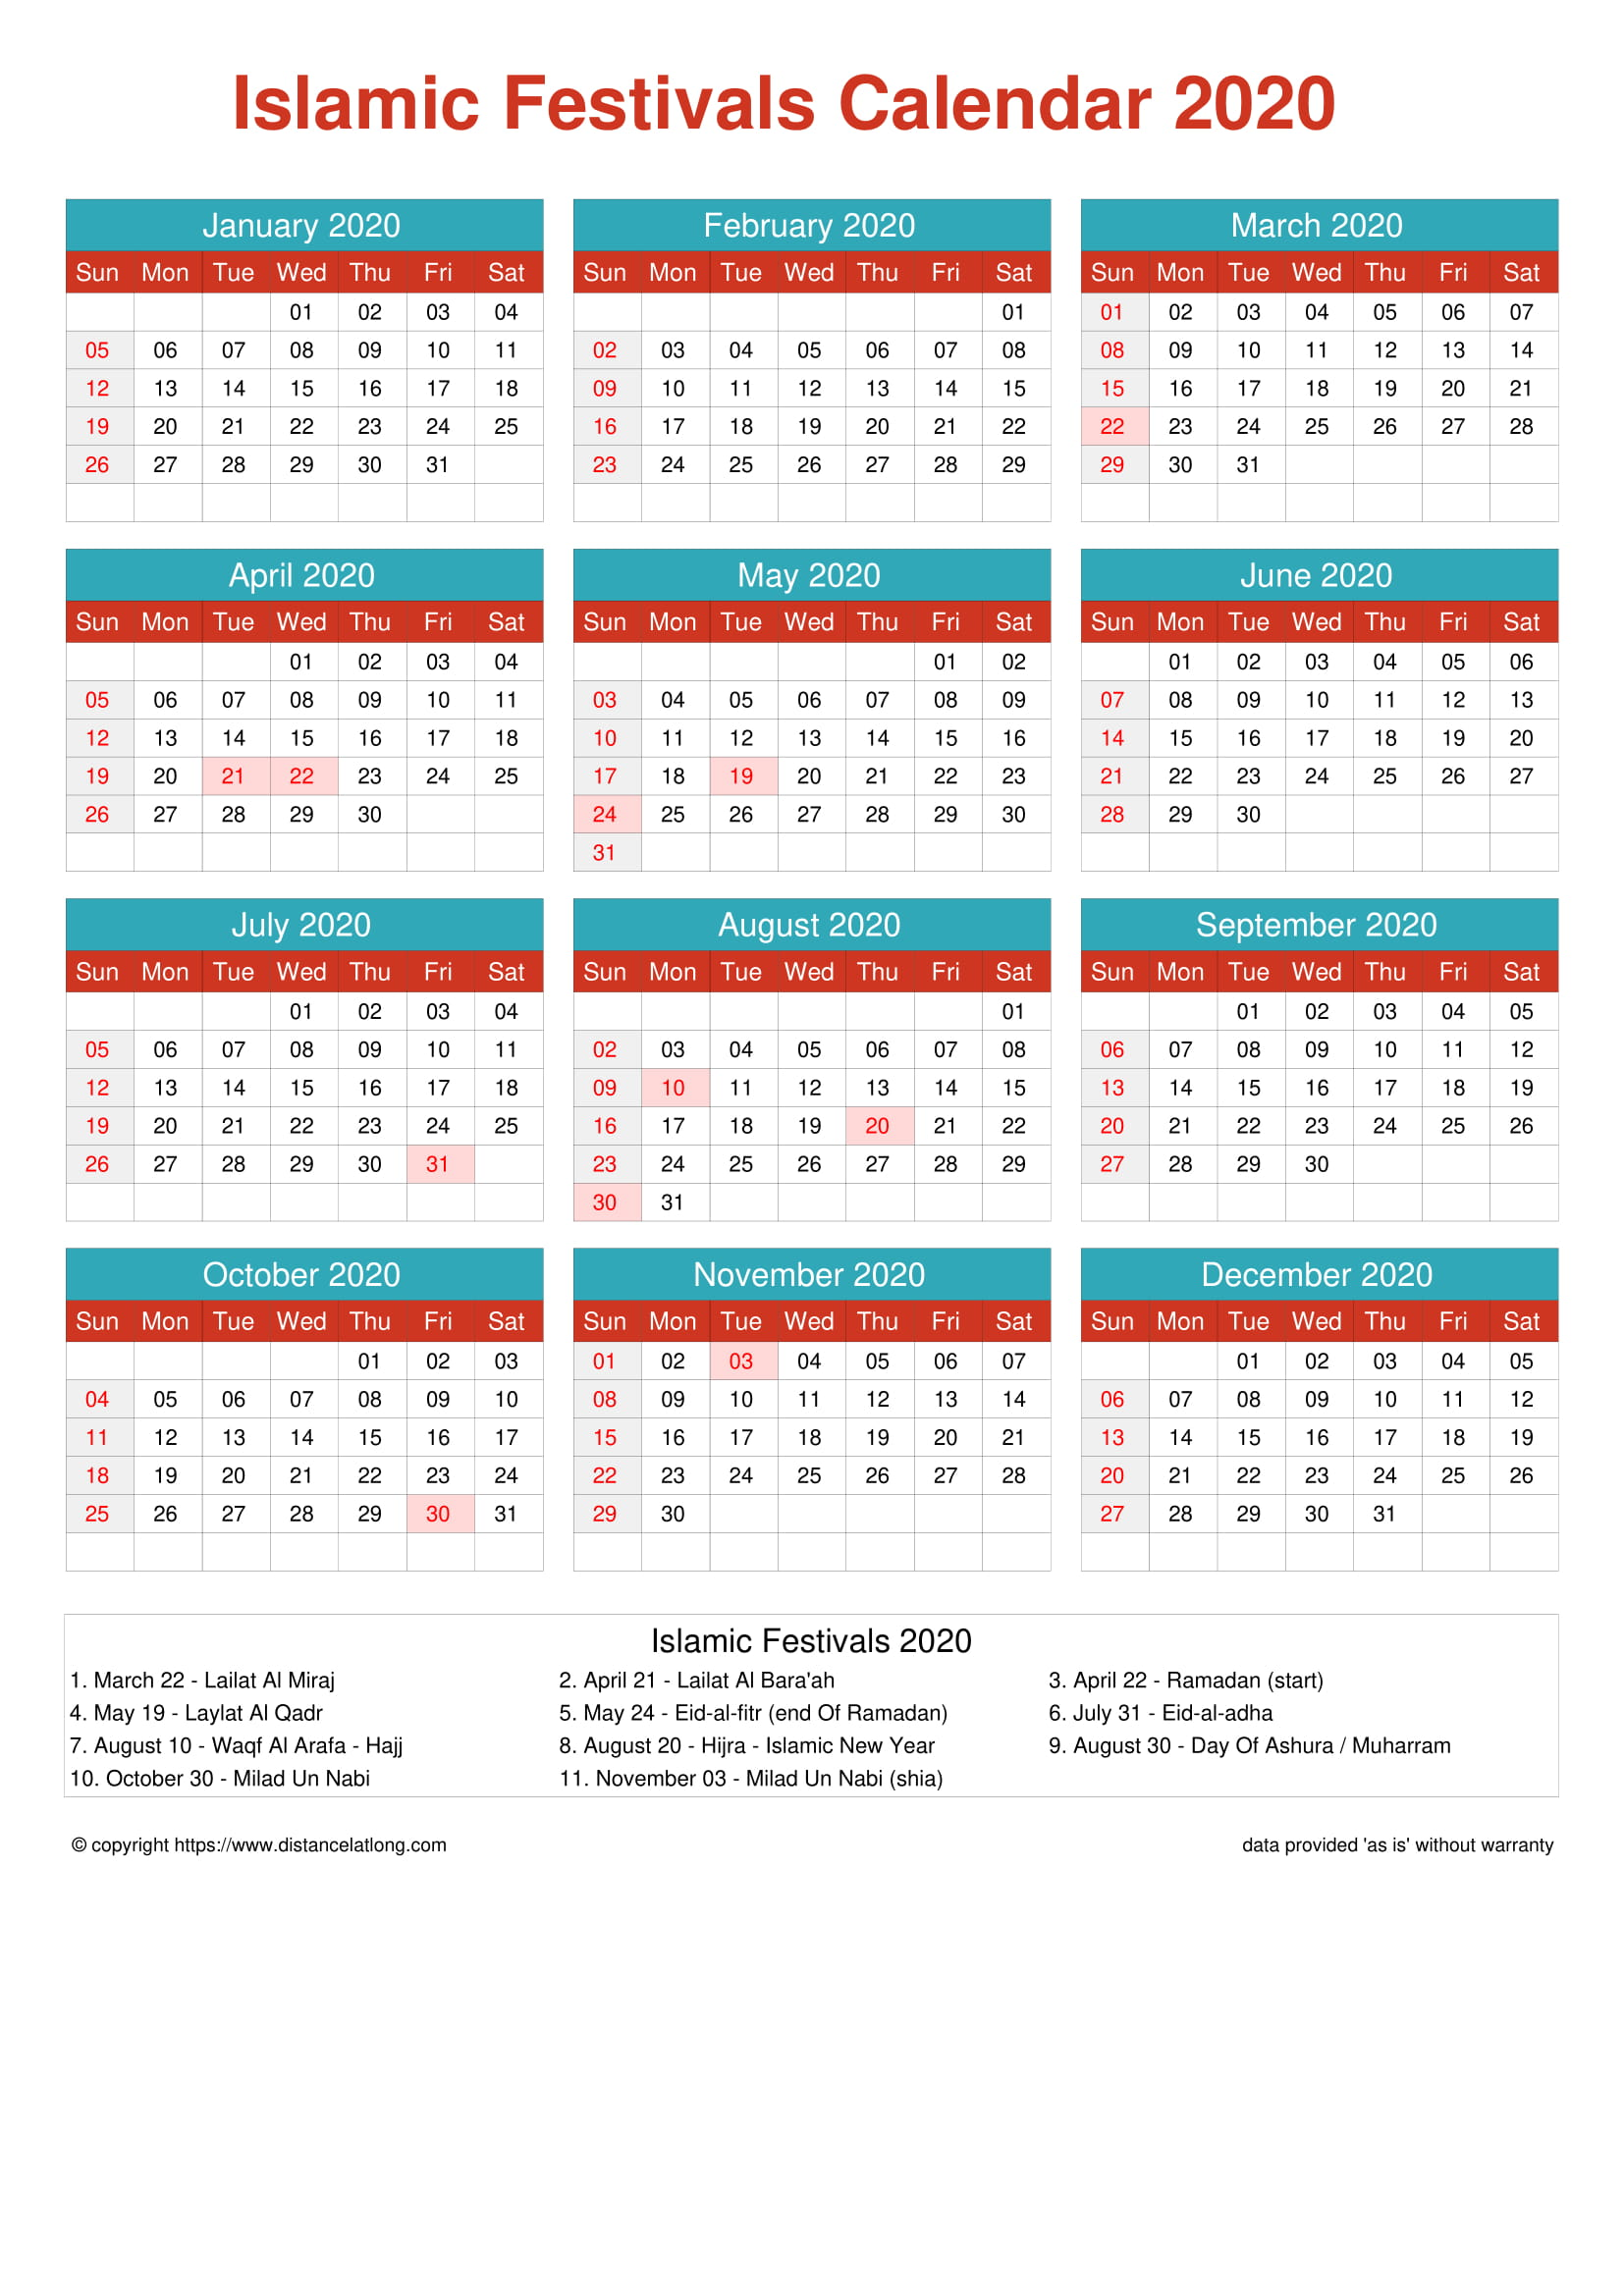 Muslim Calendar 2022.2020 Islamic Religious Calendar Islamic Religious Portrait Orientation Free Printable Templates Free Download Distancelatlong Com